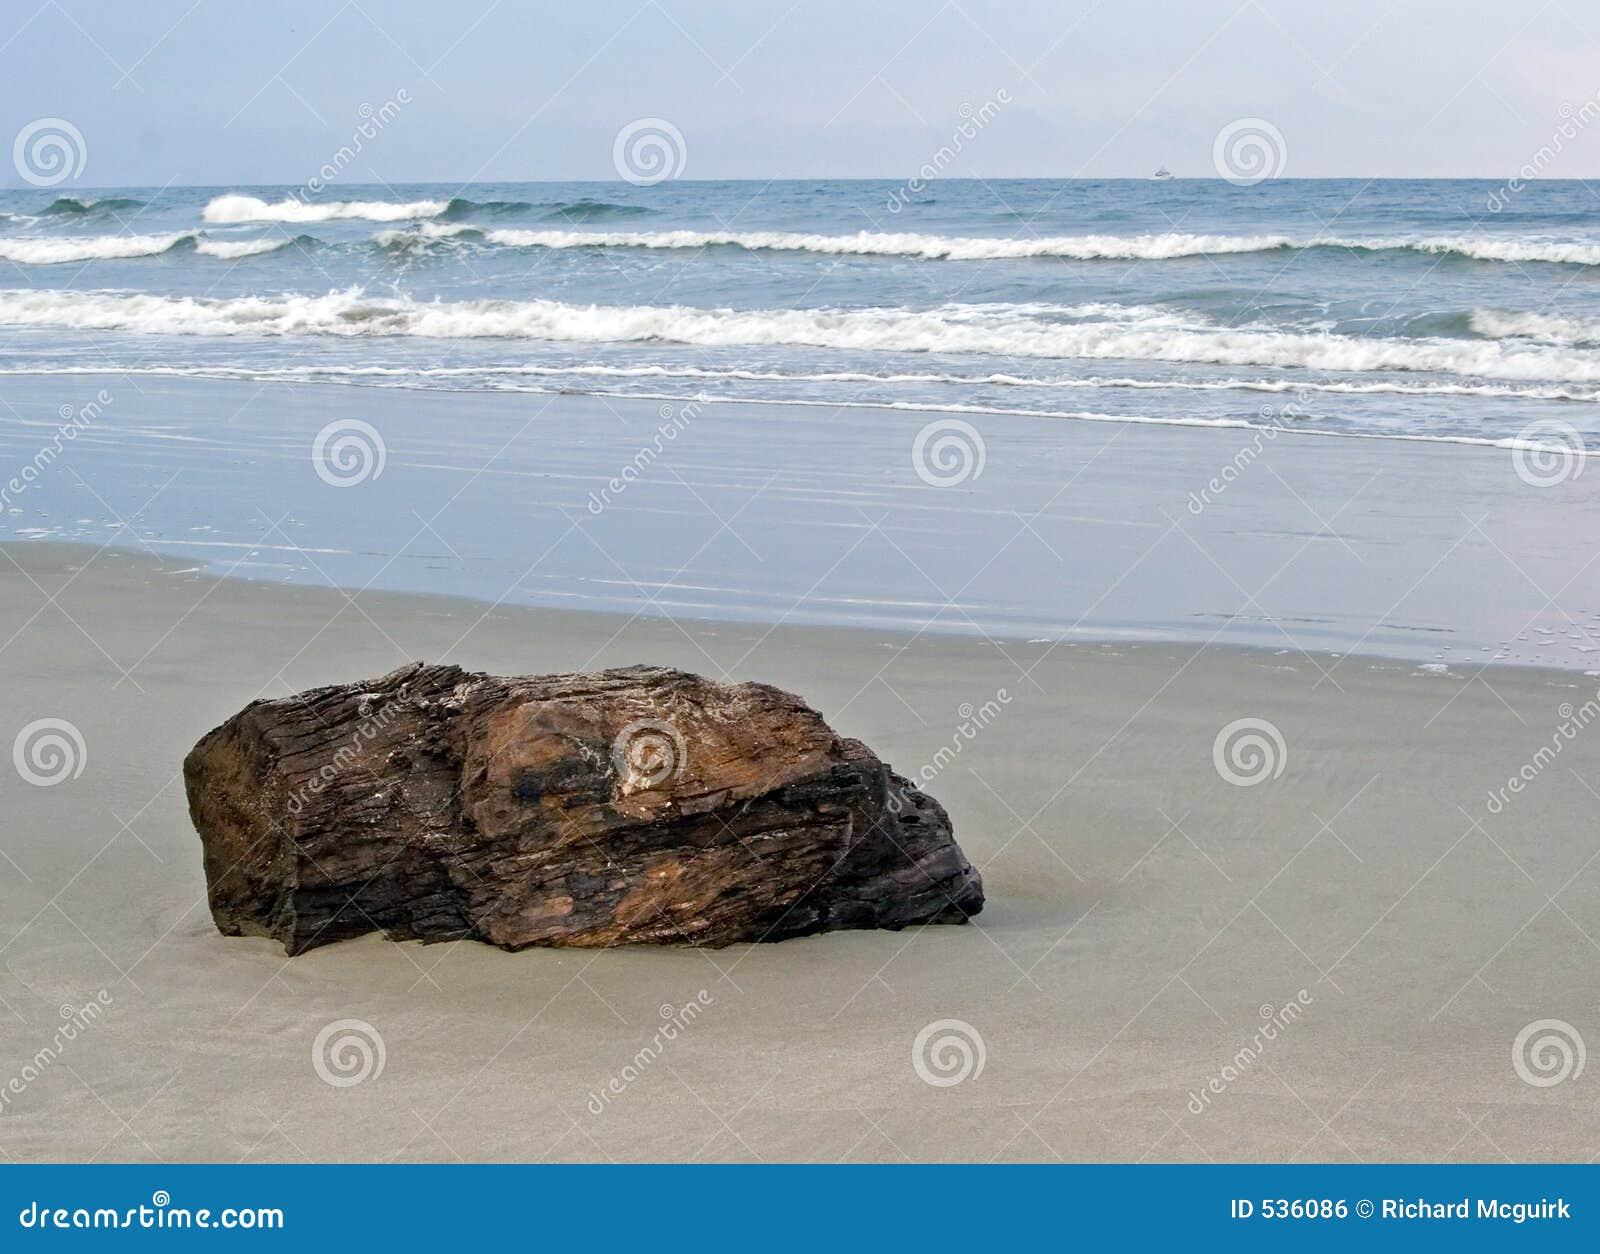 Download Driftwood foto de stock. Imagem de cópia, cinzento, costa - 536086